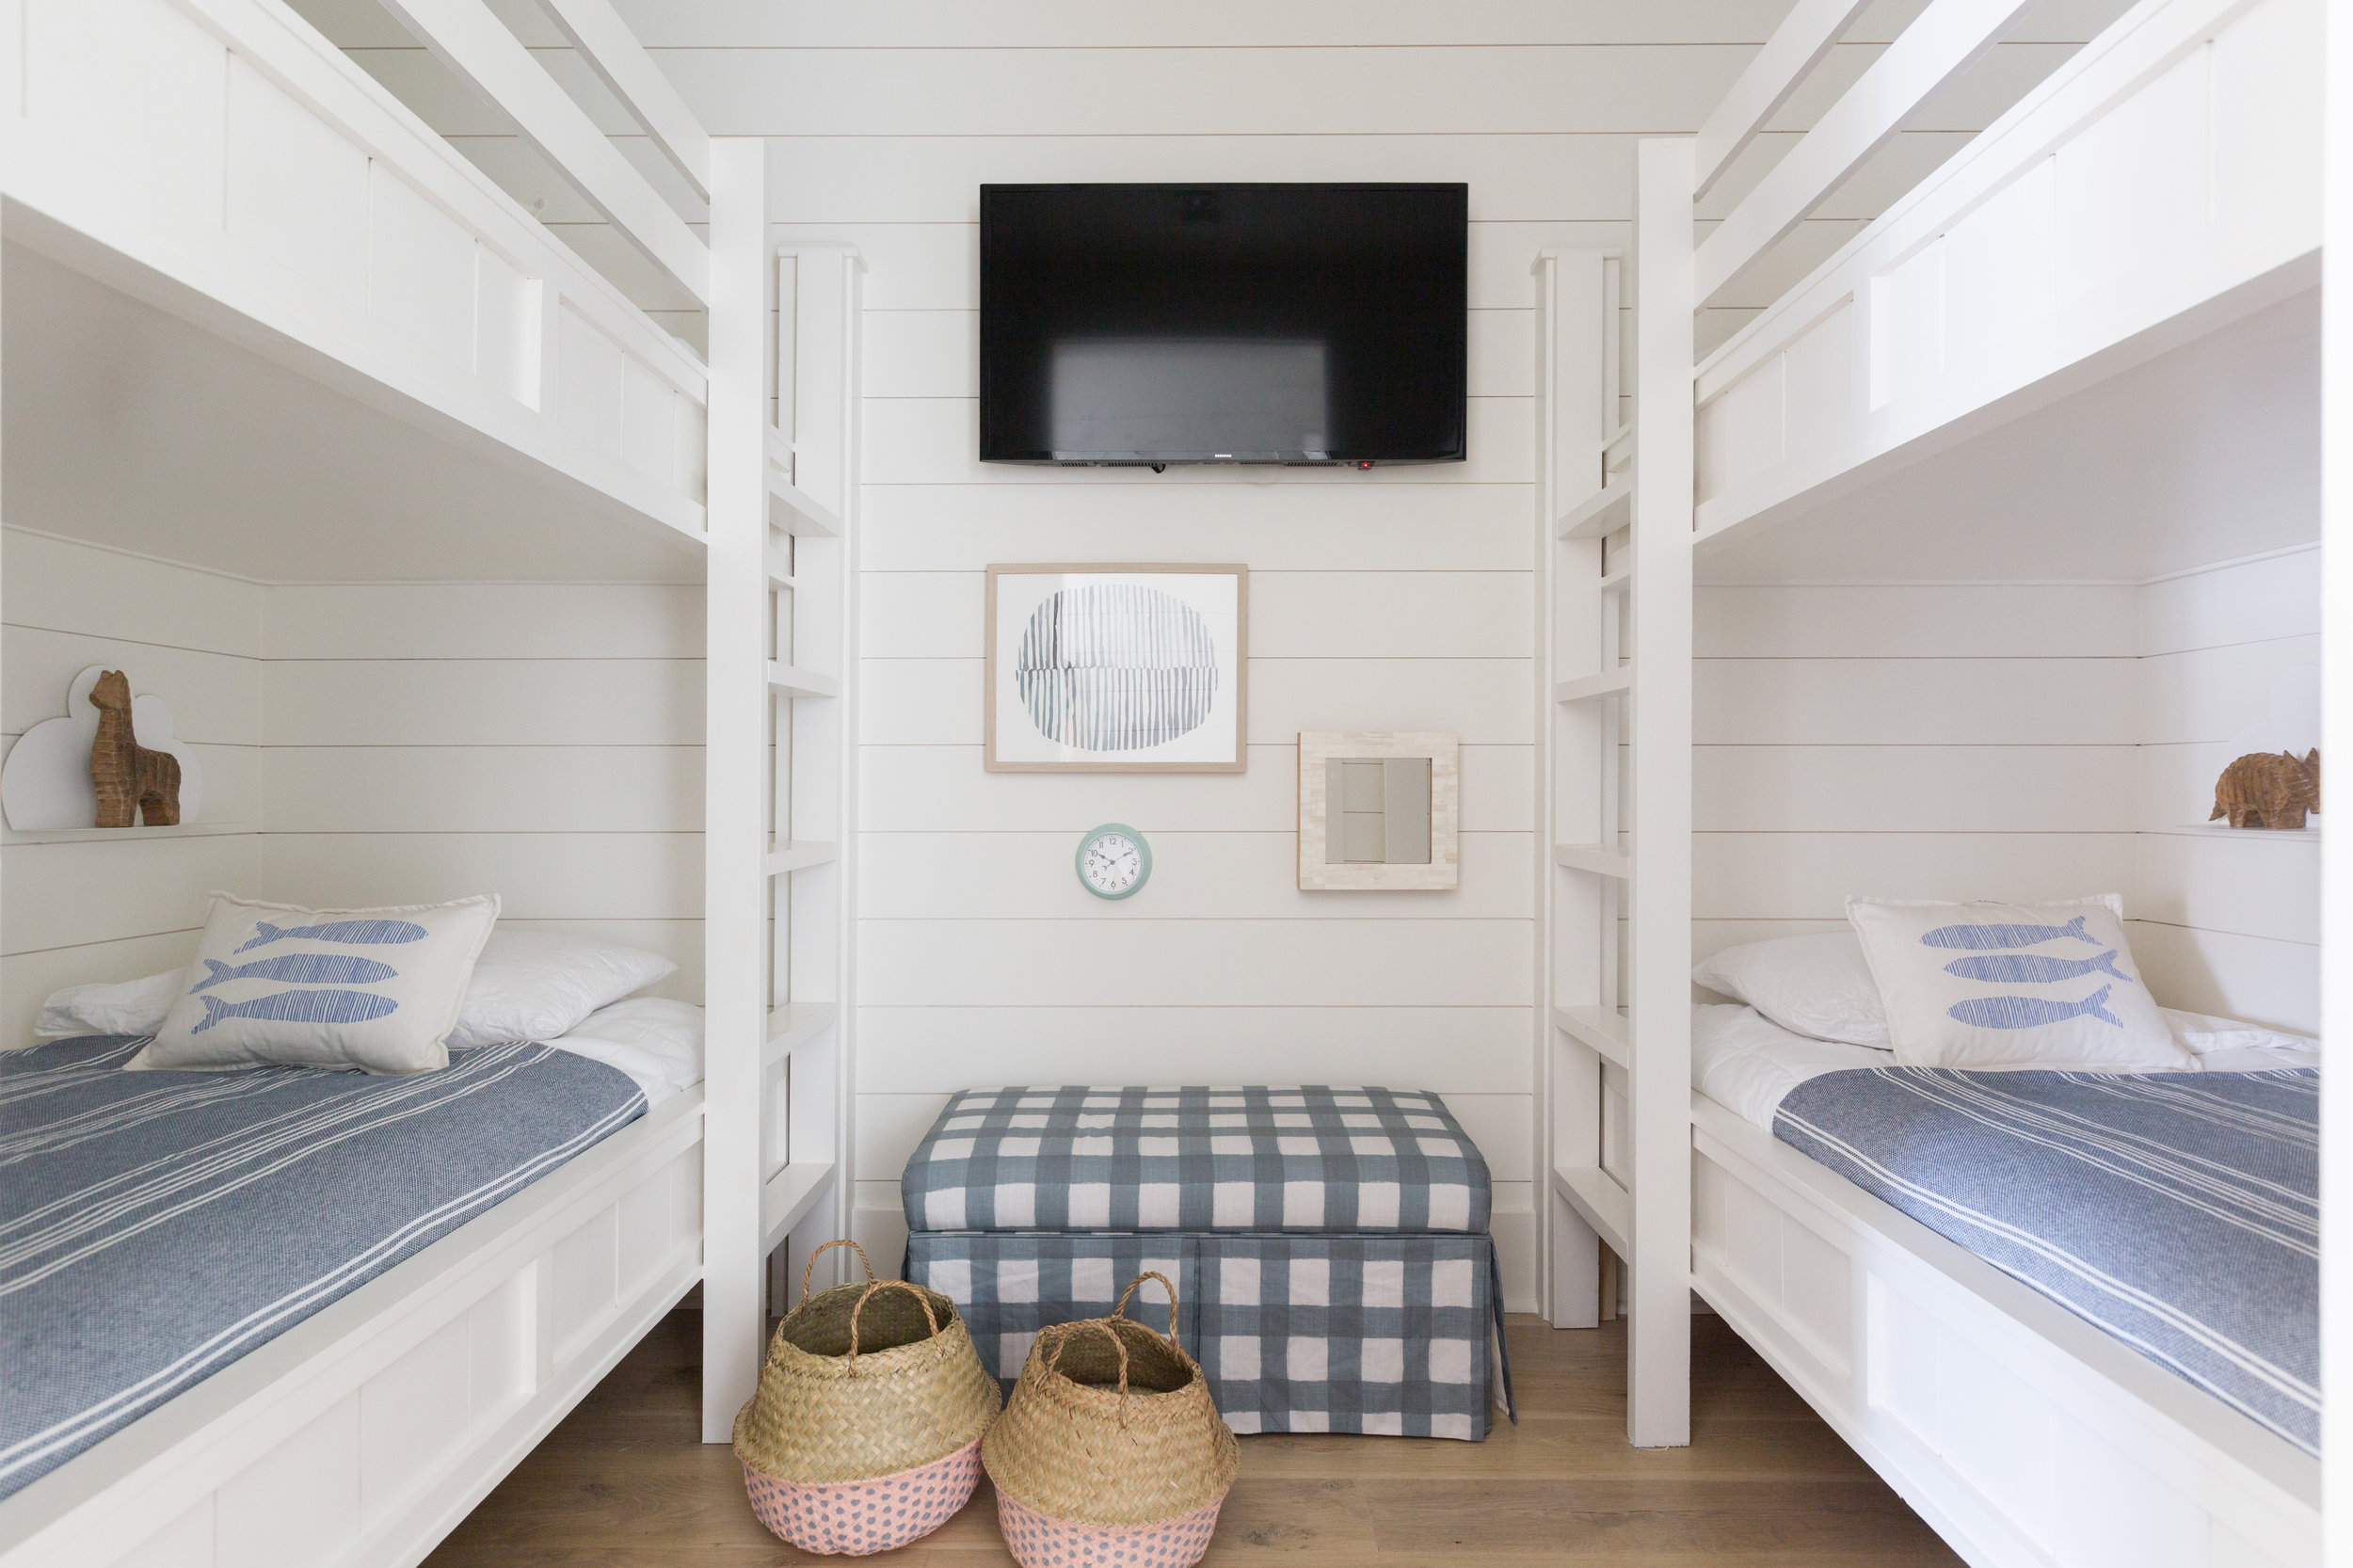 Love this bunk room in this beach house! Shiplap walls are beautiful too kellyelko.com #kidsrooms #bedrooms #bunkroom